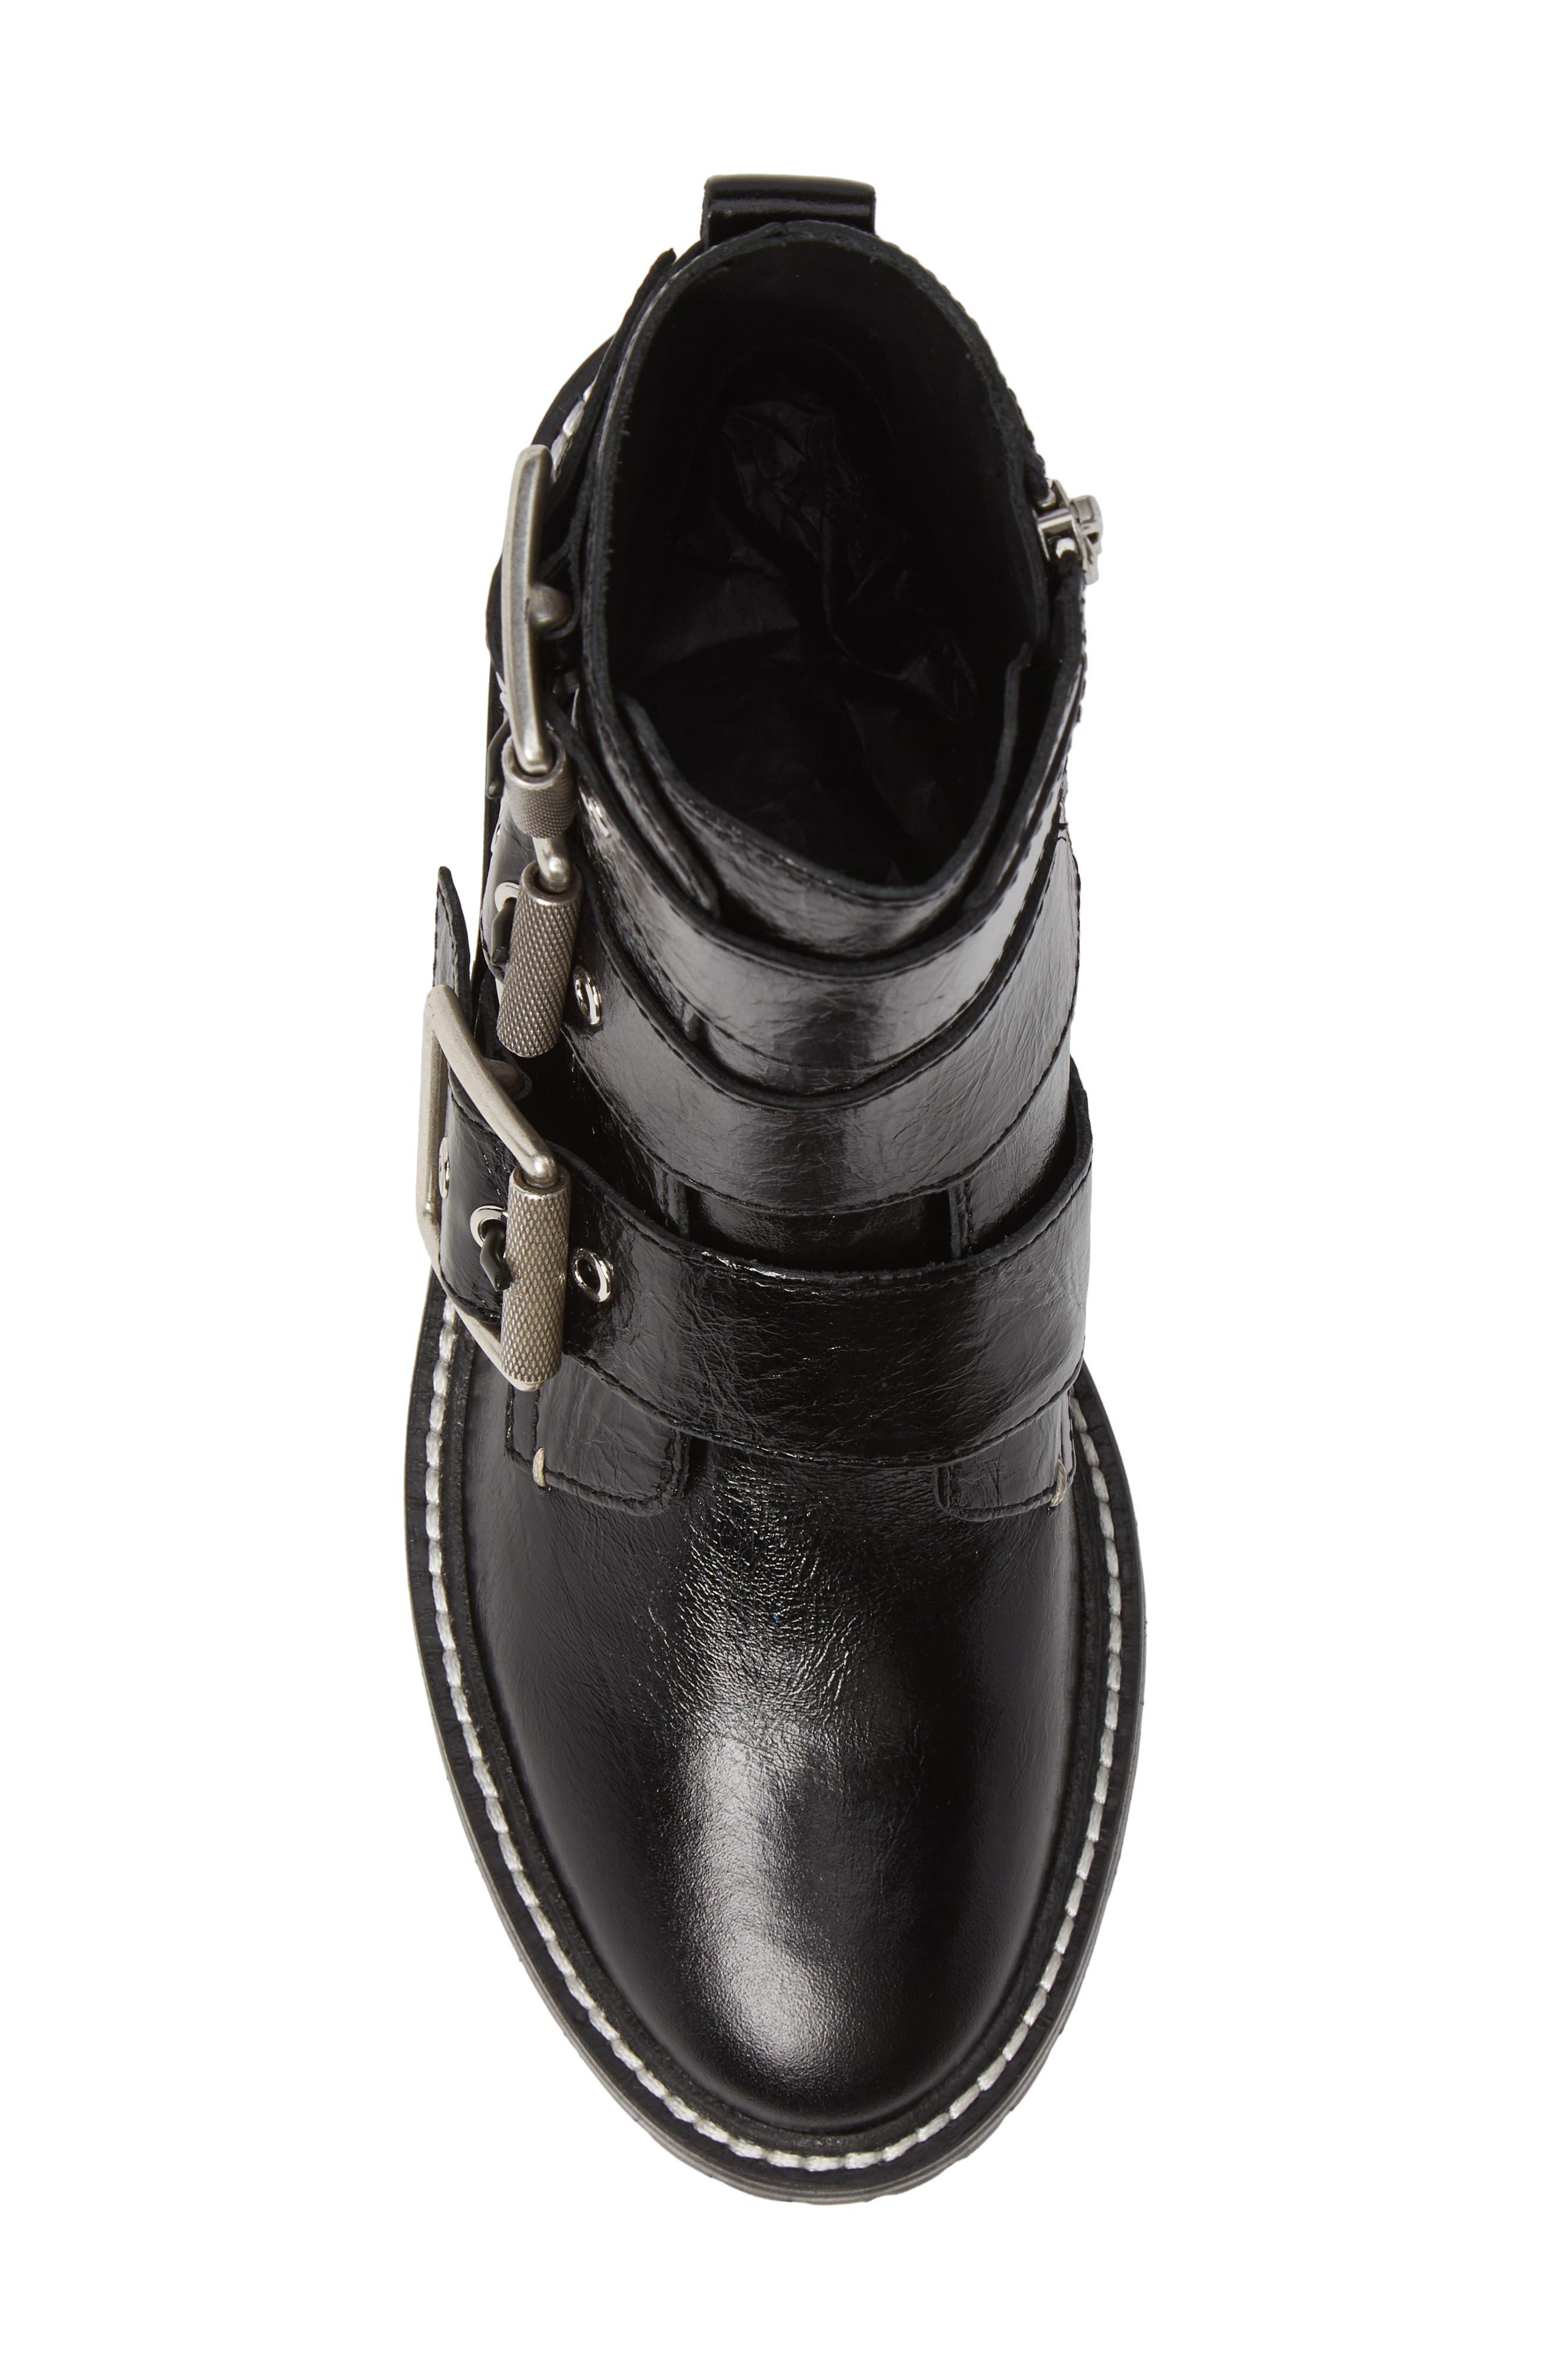 RAG & BONE, Cannon Buckle Moto Boot, Alternate thumbnail 5, color, BLACK